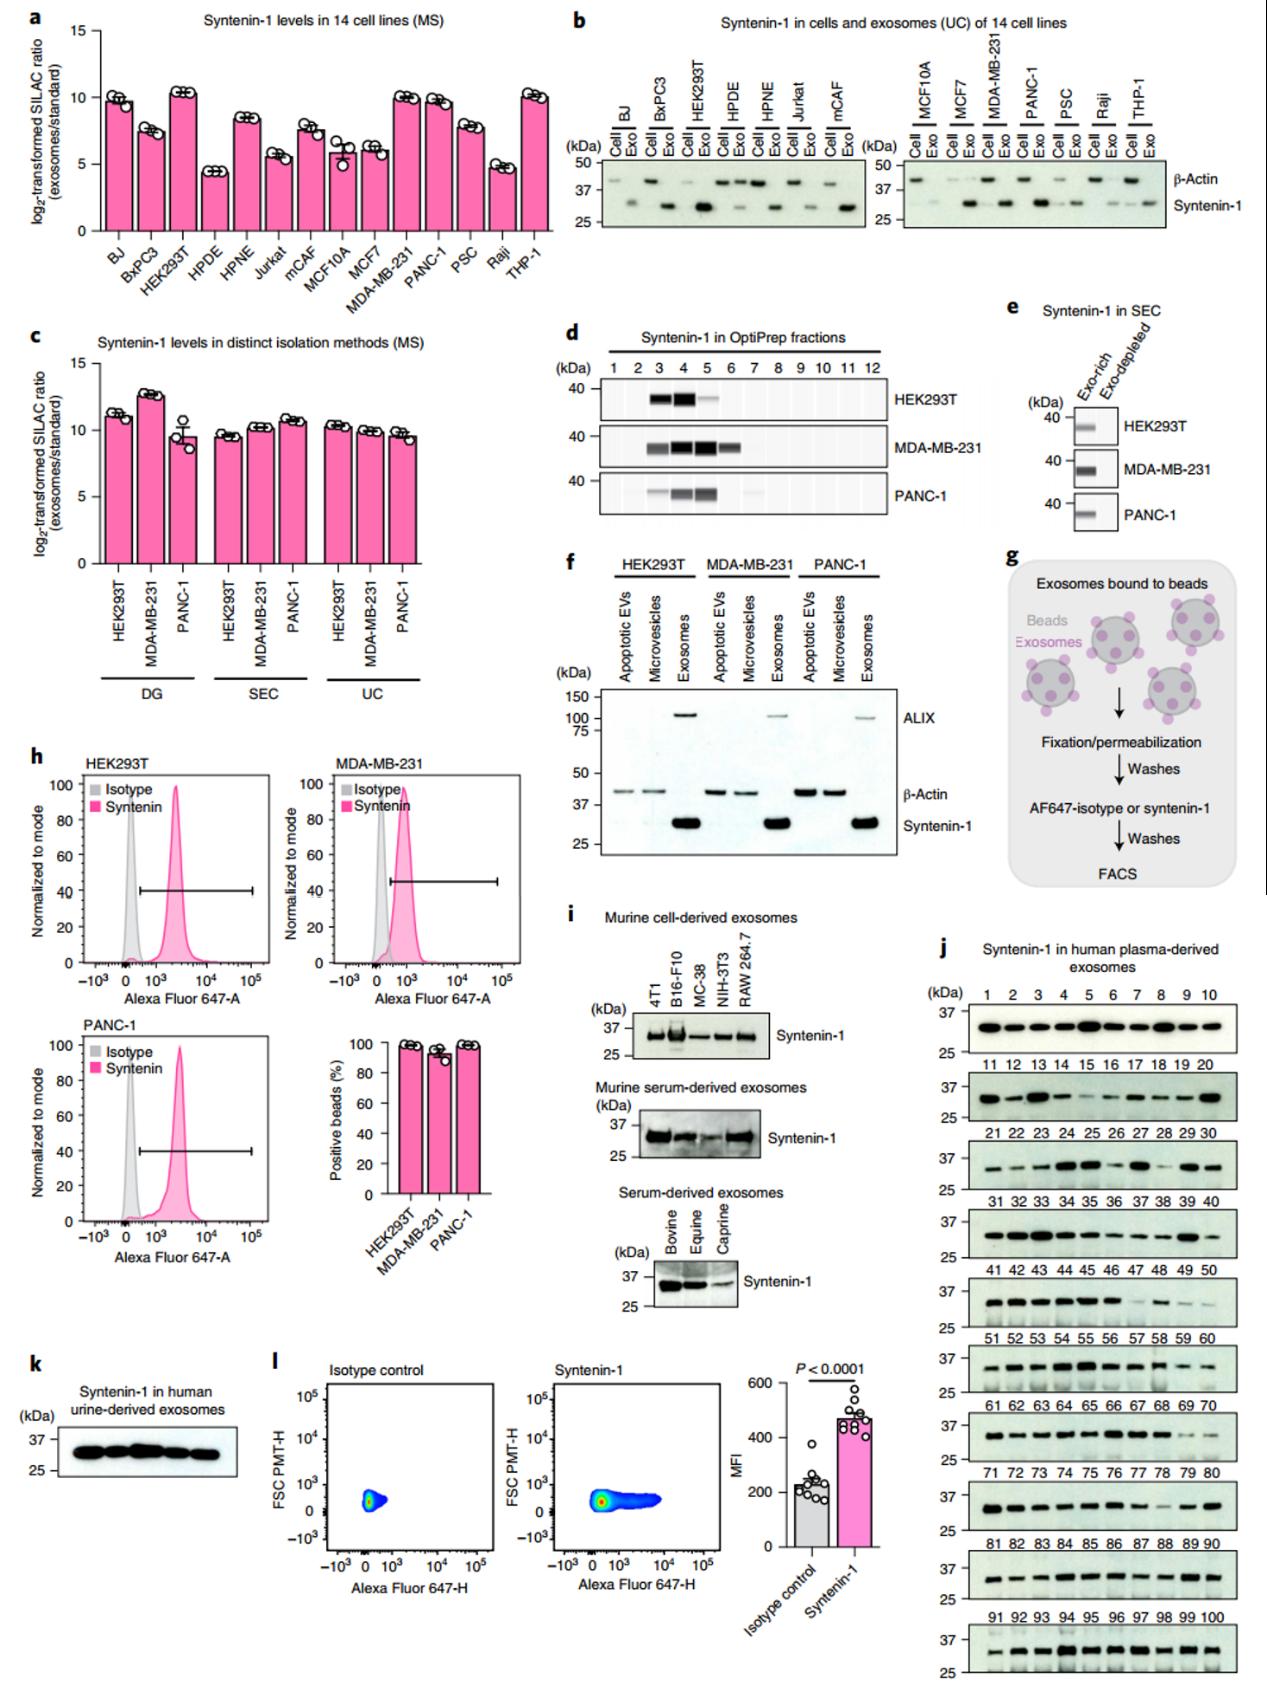 【NCB】Kalluri团队利用定量蛋白质组学发现外泌体普遍富集和缺乏的蛋白质,其中Syntenin-1丰度最高可作为标志性蛋白